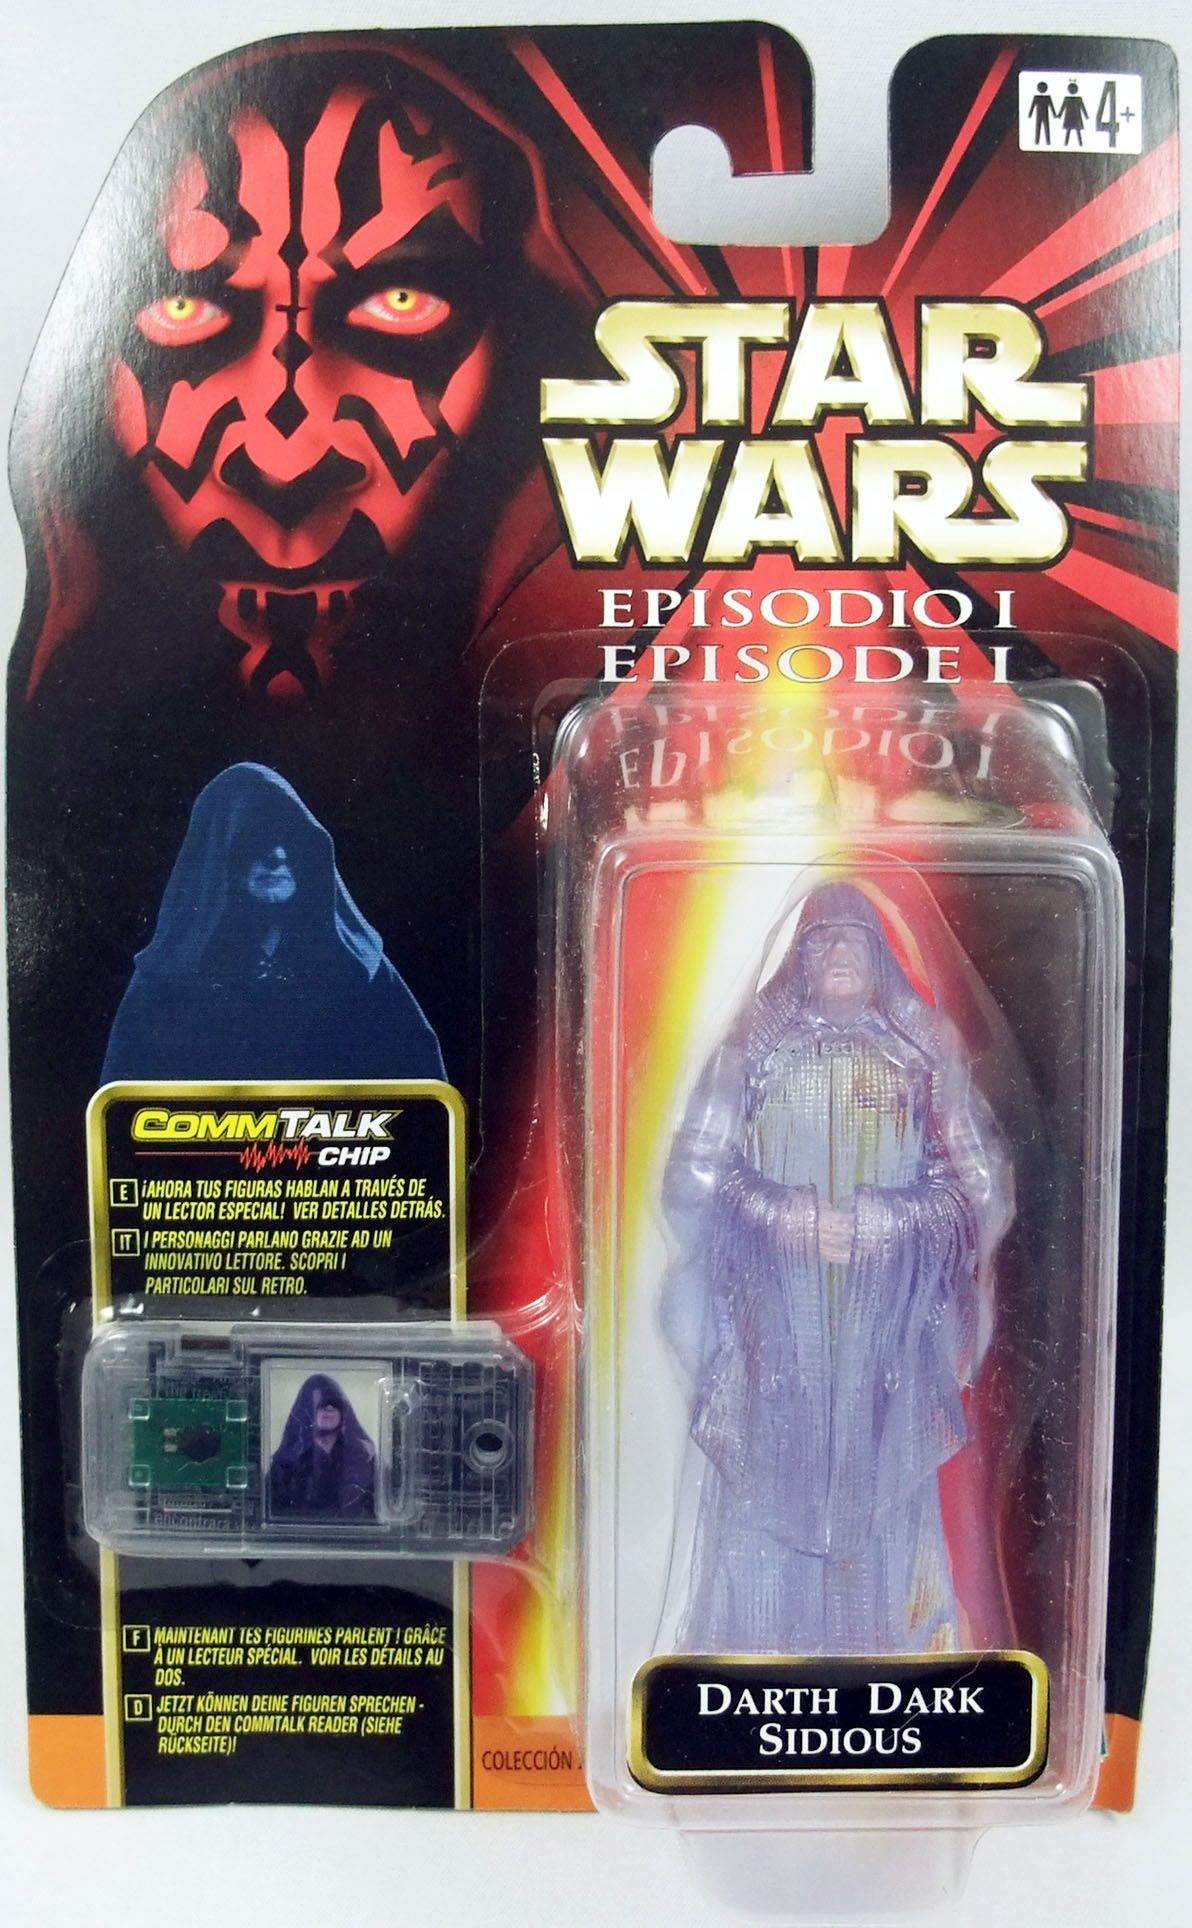 Star Wars Episode 1 (The Phantom Menace) - Hasbro - Darth Sidious Hologram